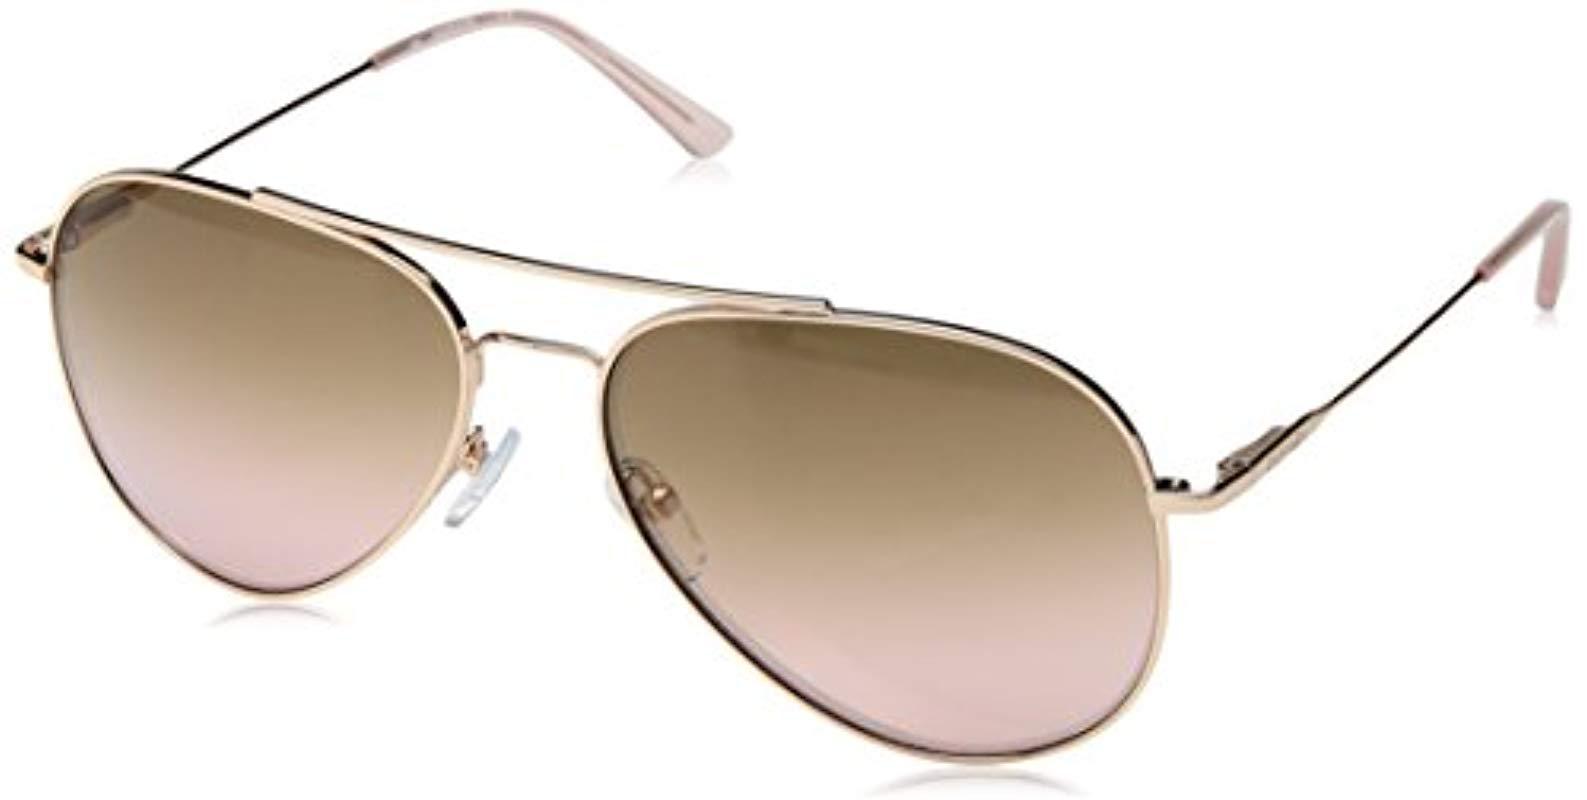 92d17c4af9 Lyst - Calvin Klein Ck18105s Aviator Sunglasses